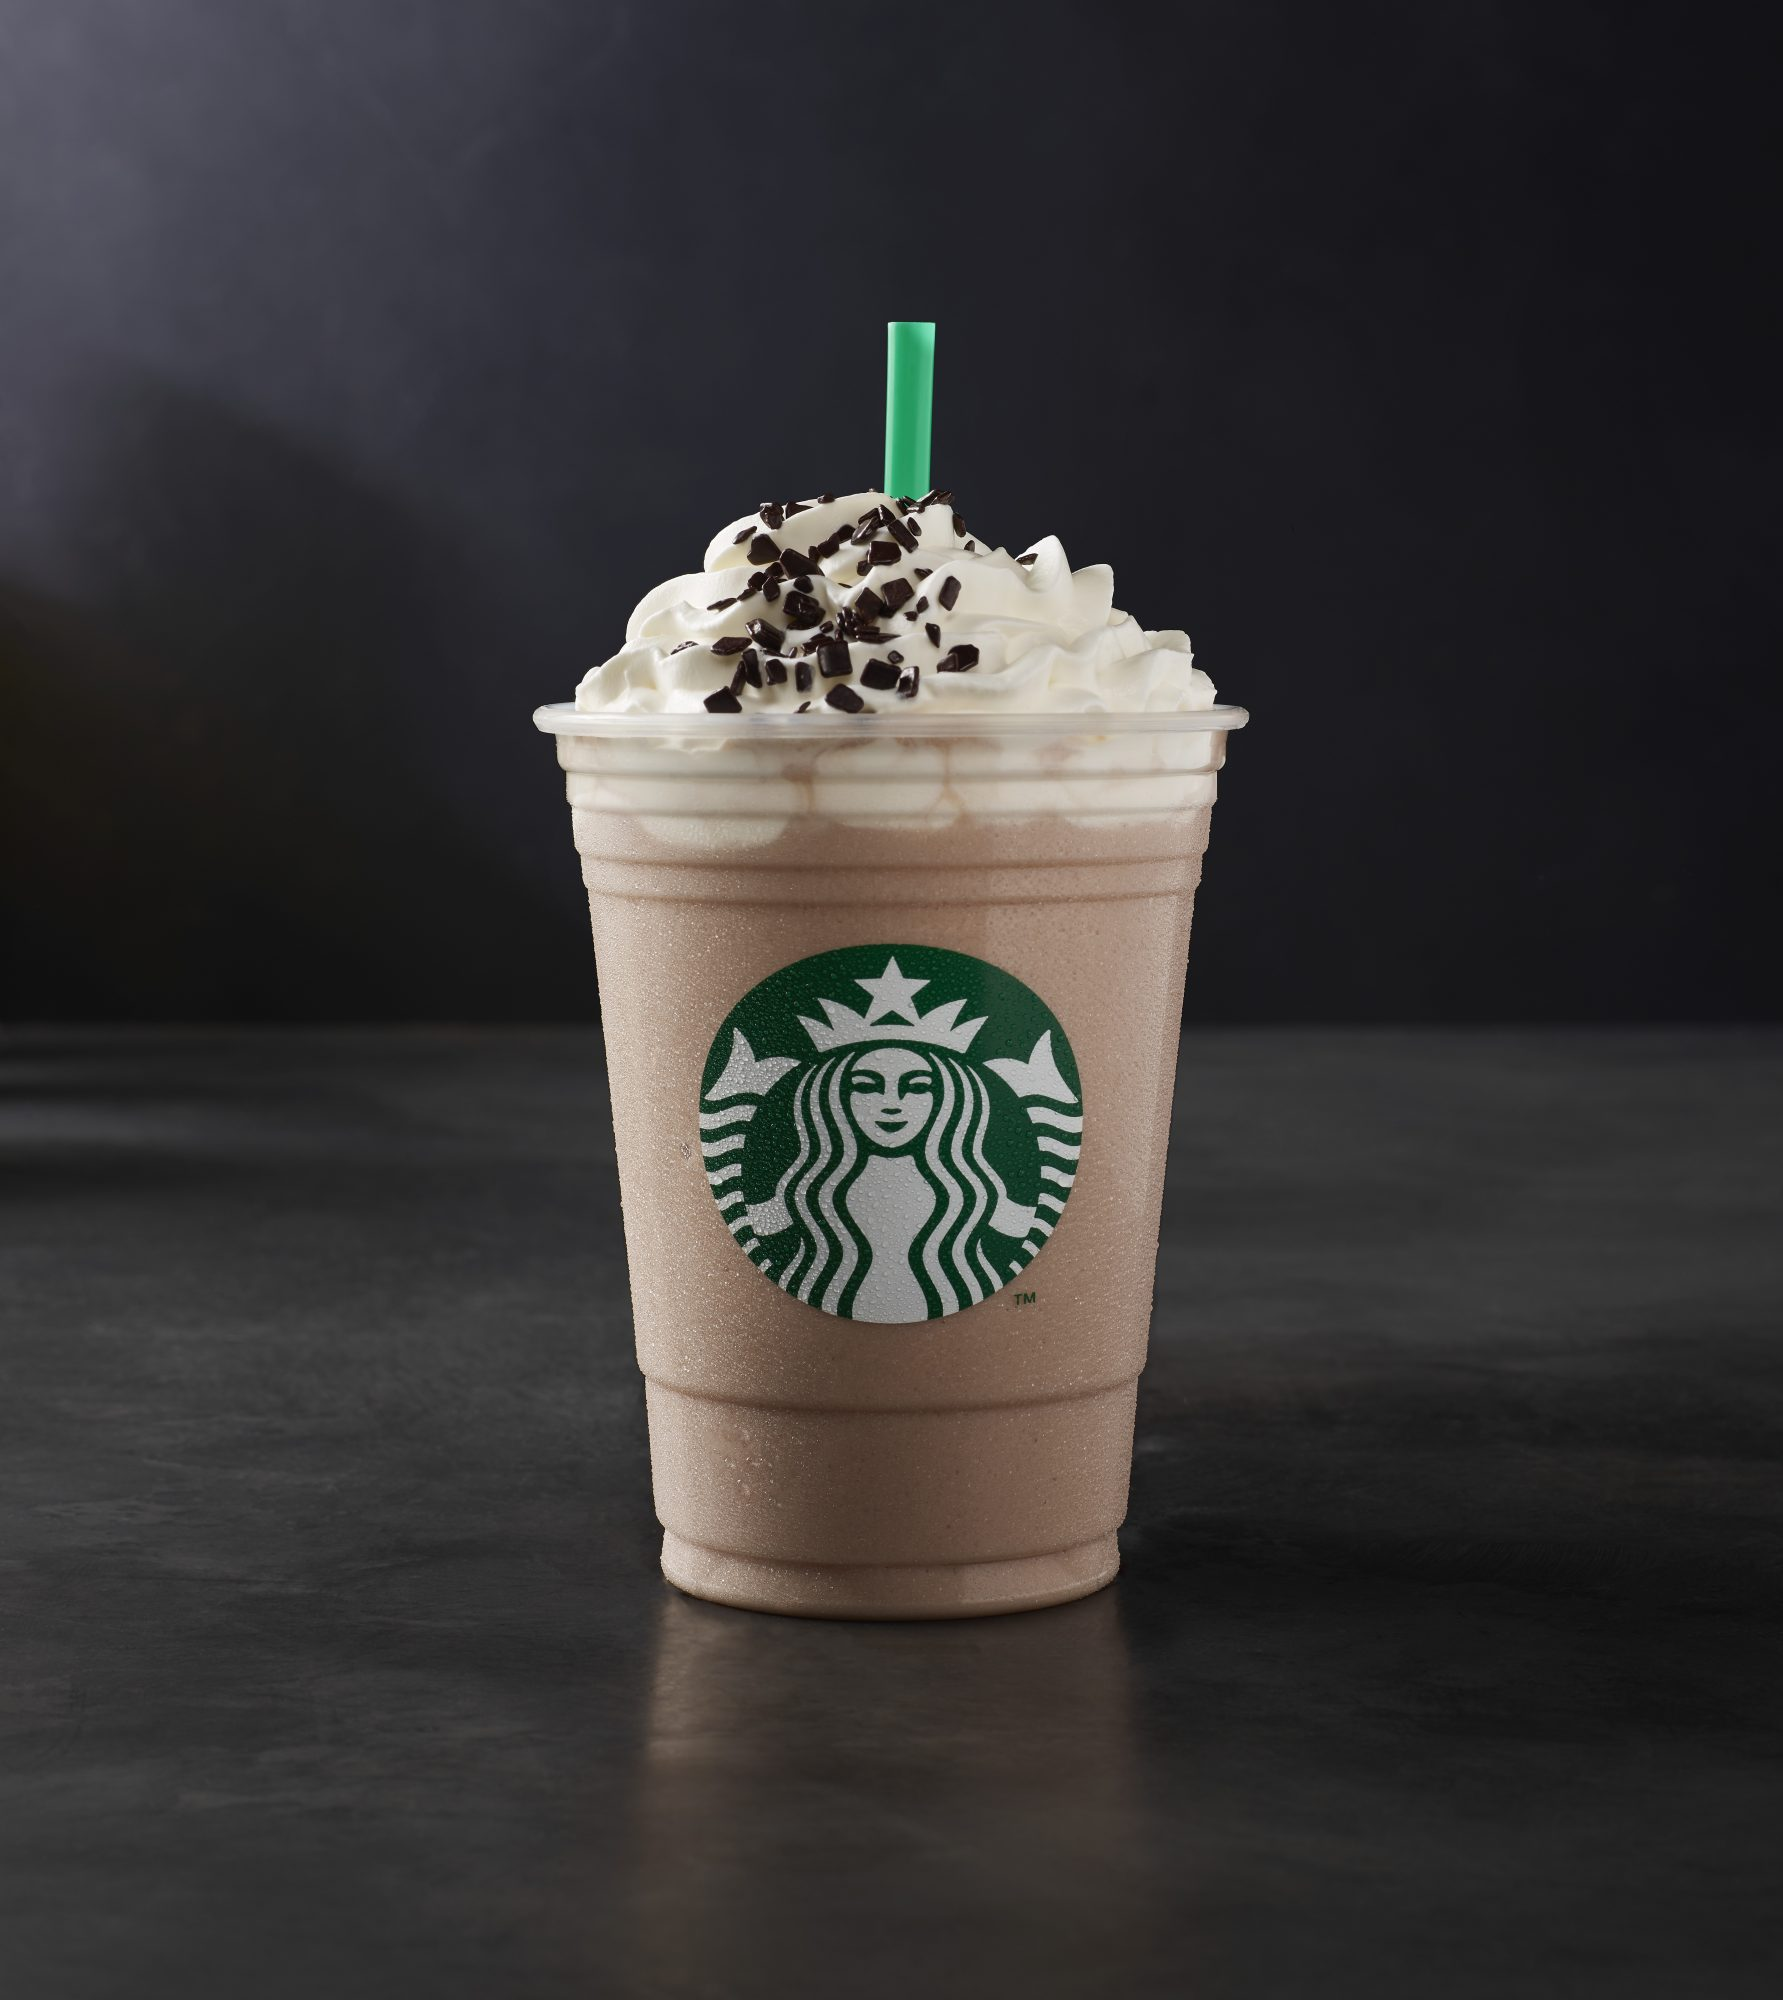 Starbucks-Black-and-White-Mocha-Frappuccino.jpg